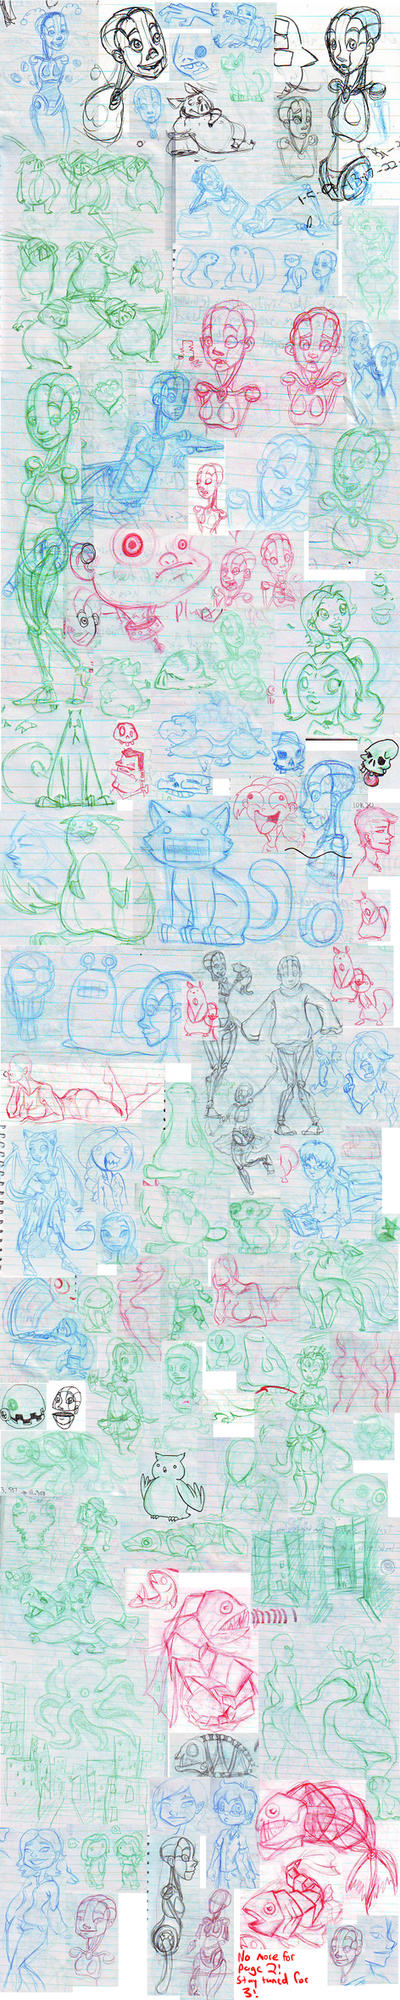 Workbook Sketchdump 2 by kippy-sneeze